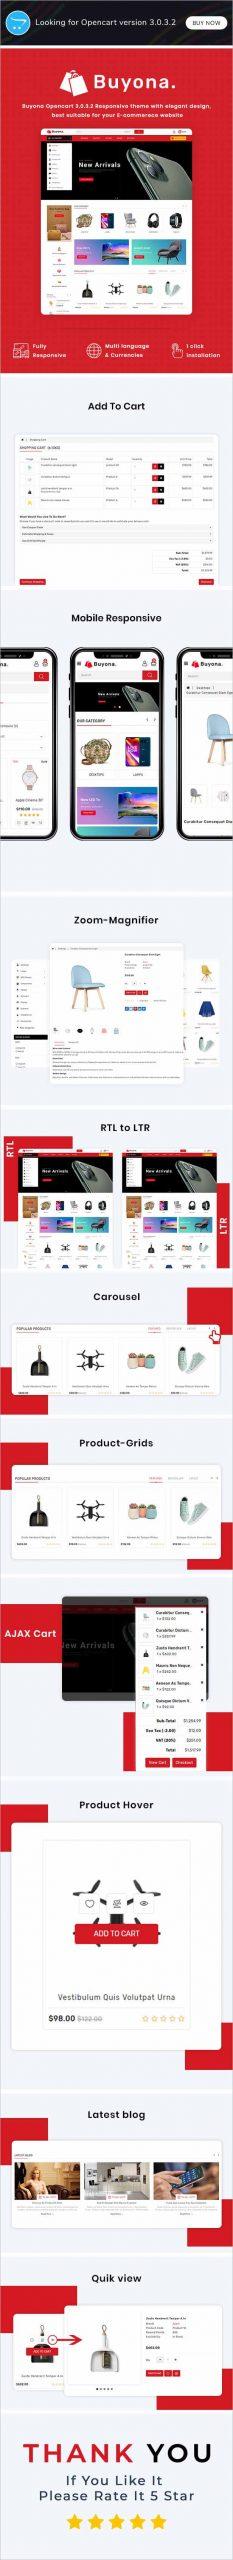 Buyona Multipurpose Responsive Opencart Theme